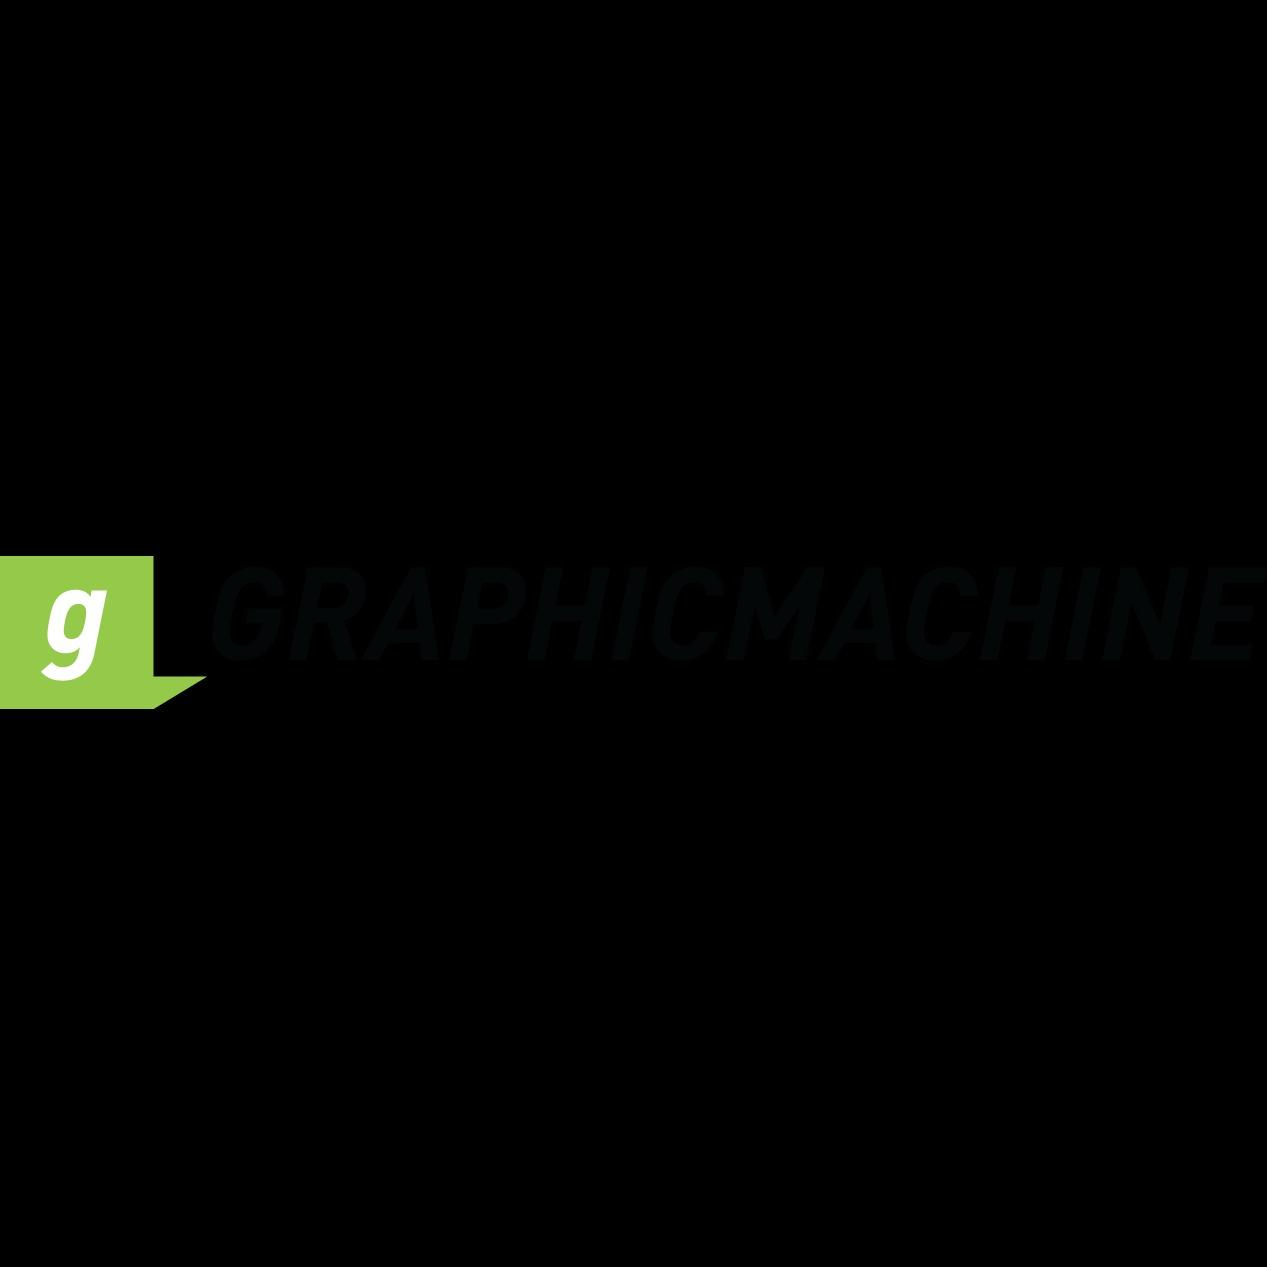 Graphicmachine, Inc.